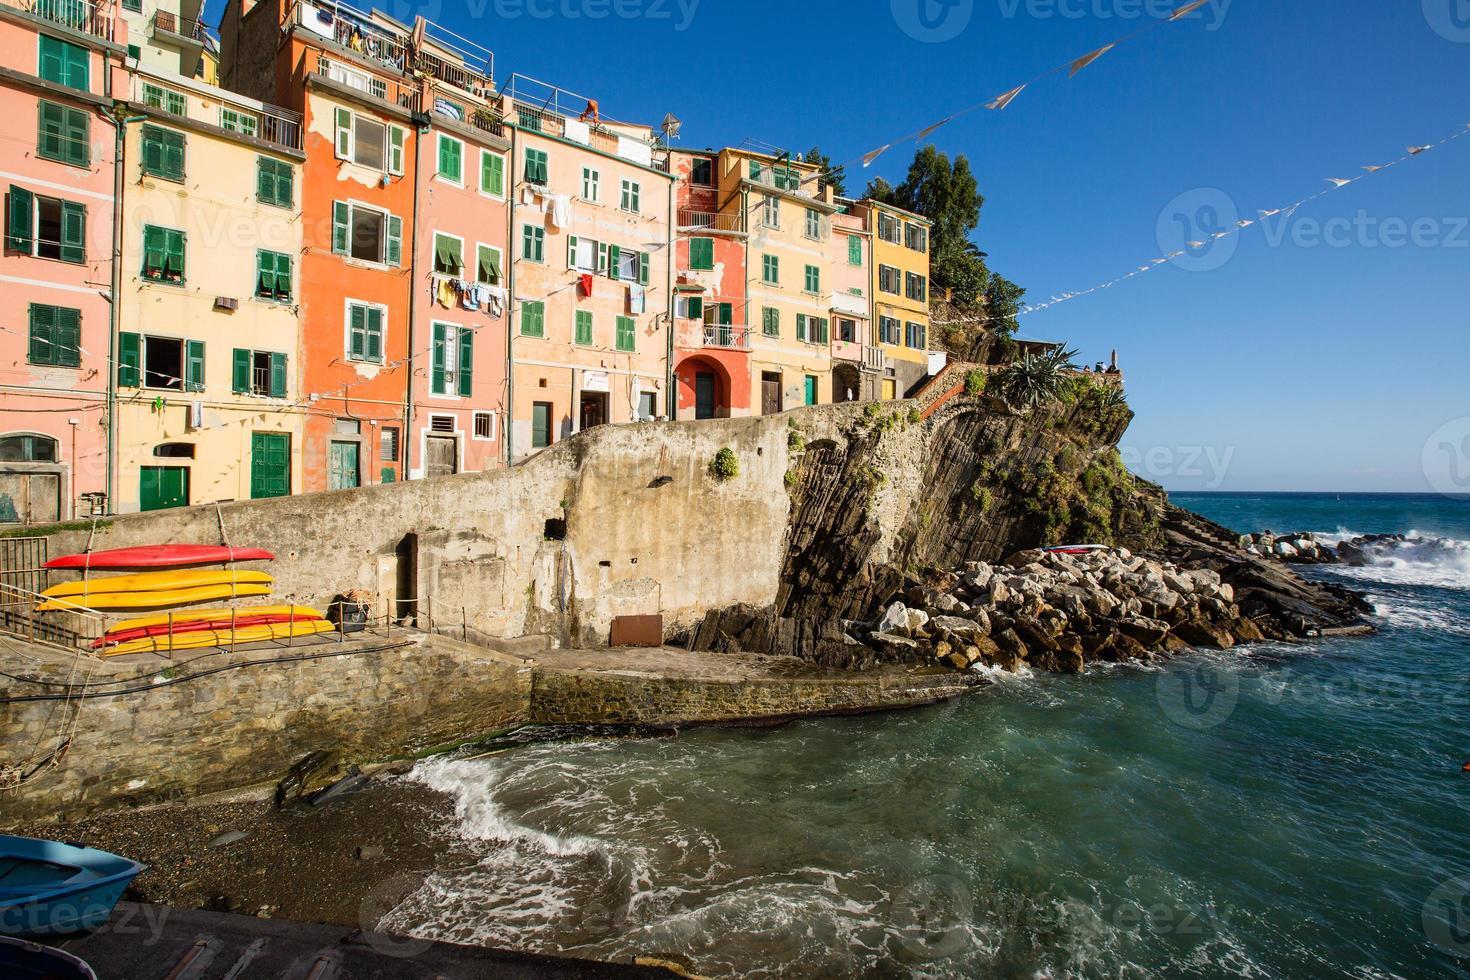 riomaggiore- italie (cinque terre- site du patrimoine mondial de l'unesco) photo